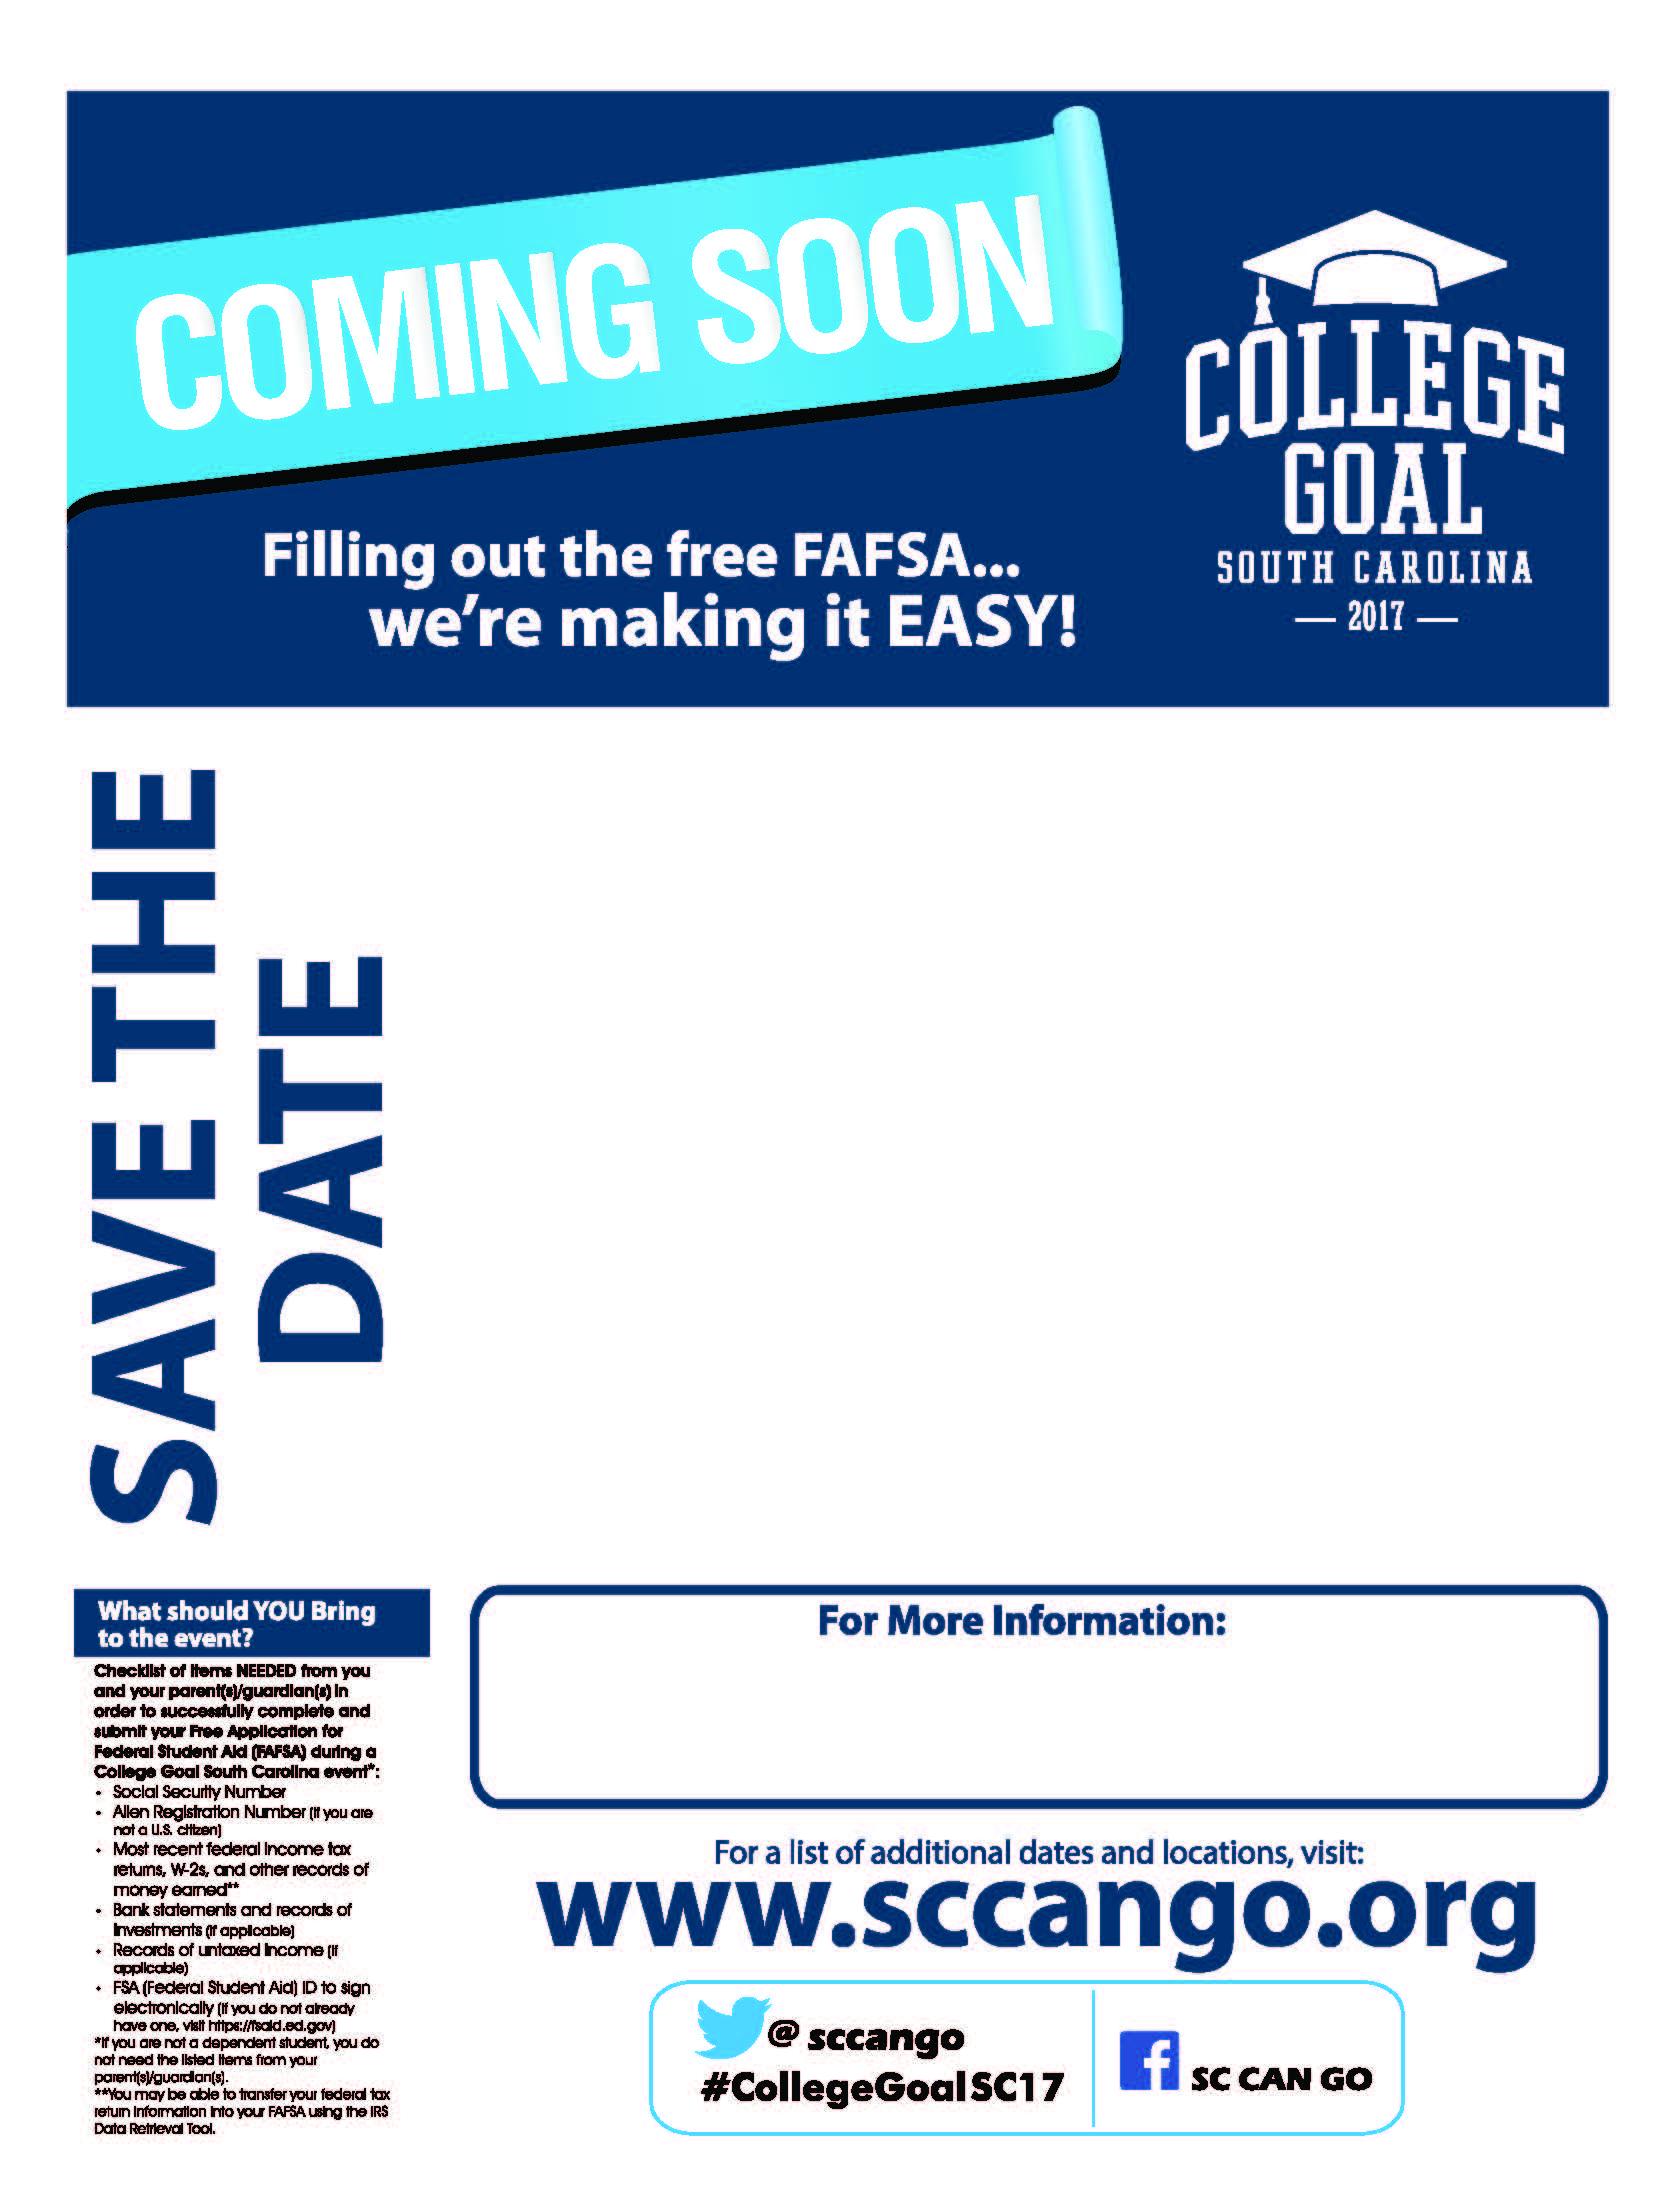 sccango  u00bb hosting a college goal sc event